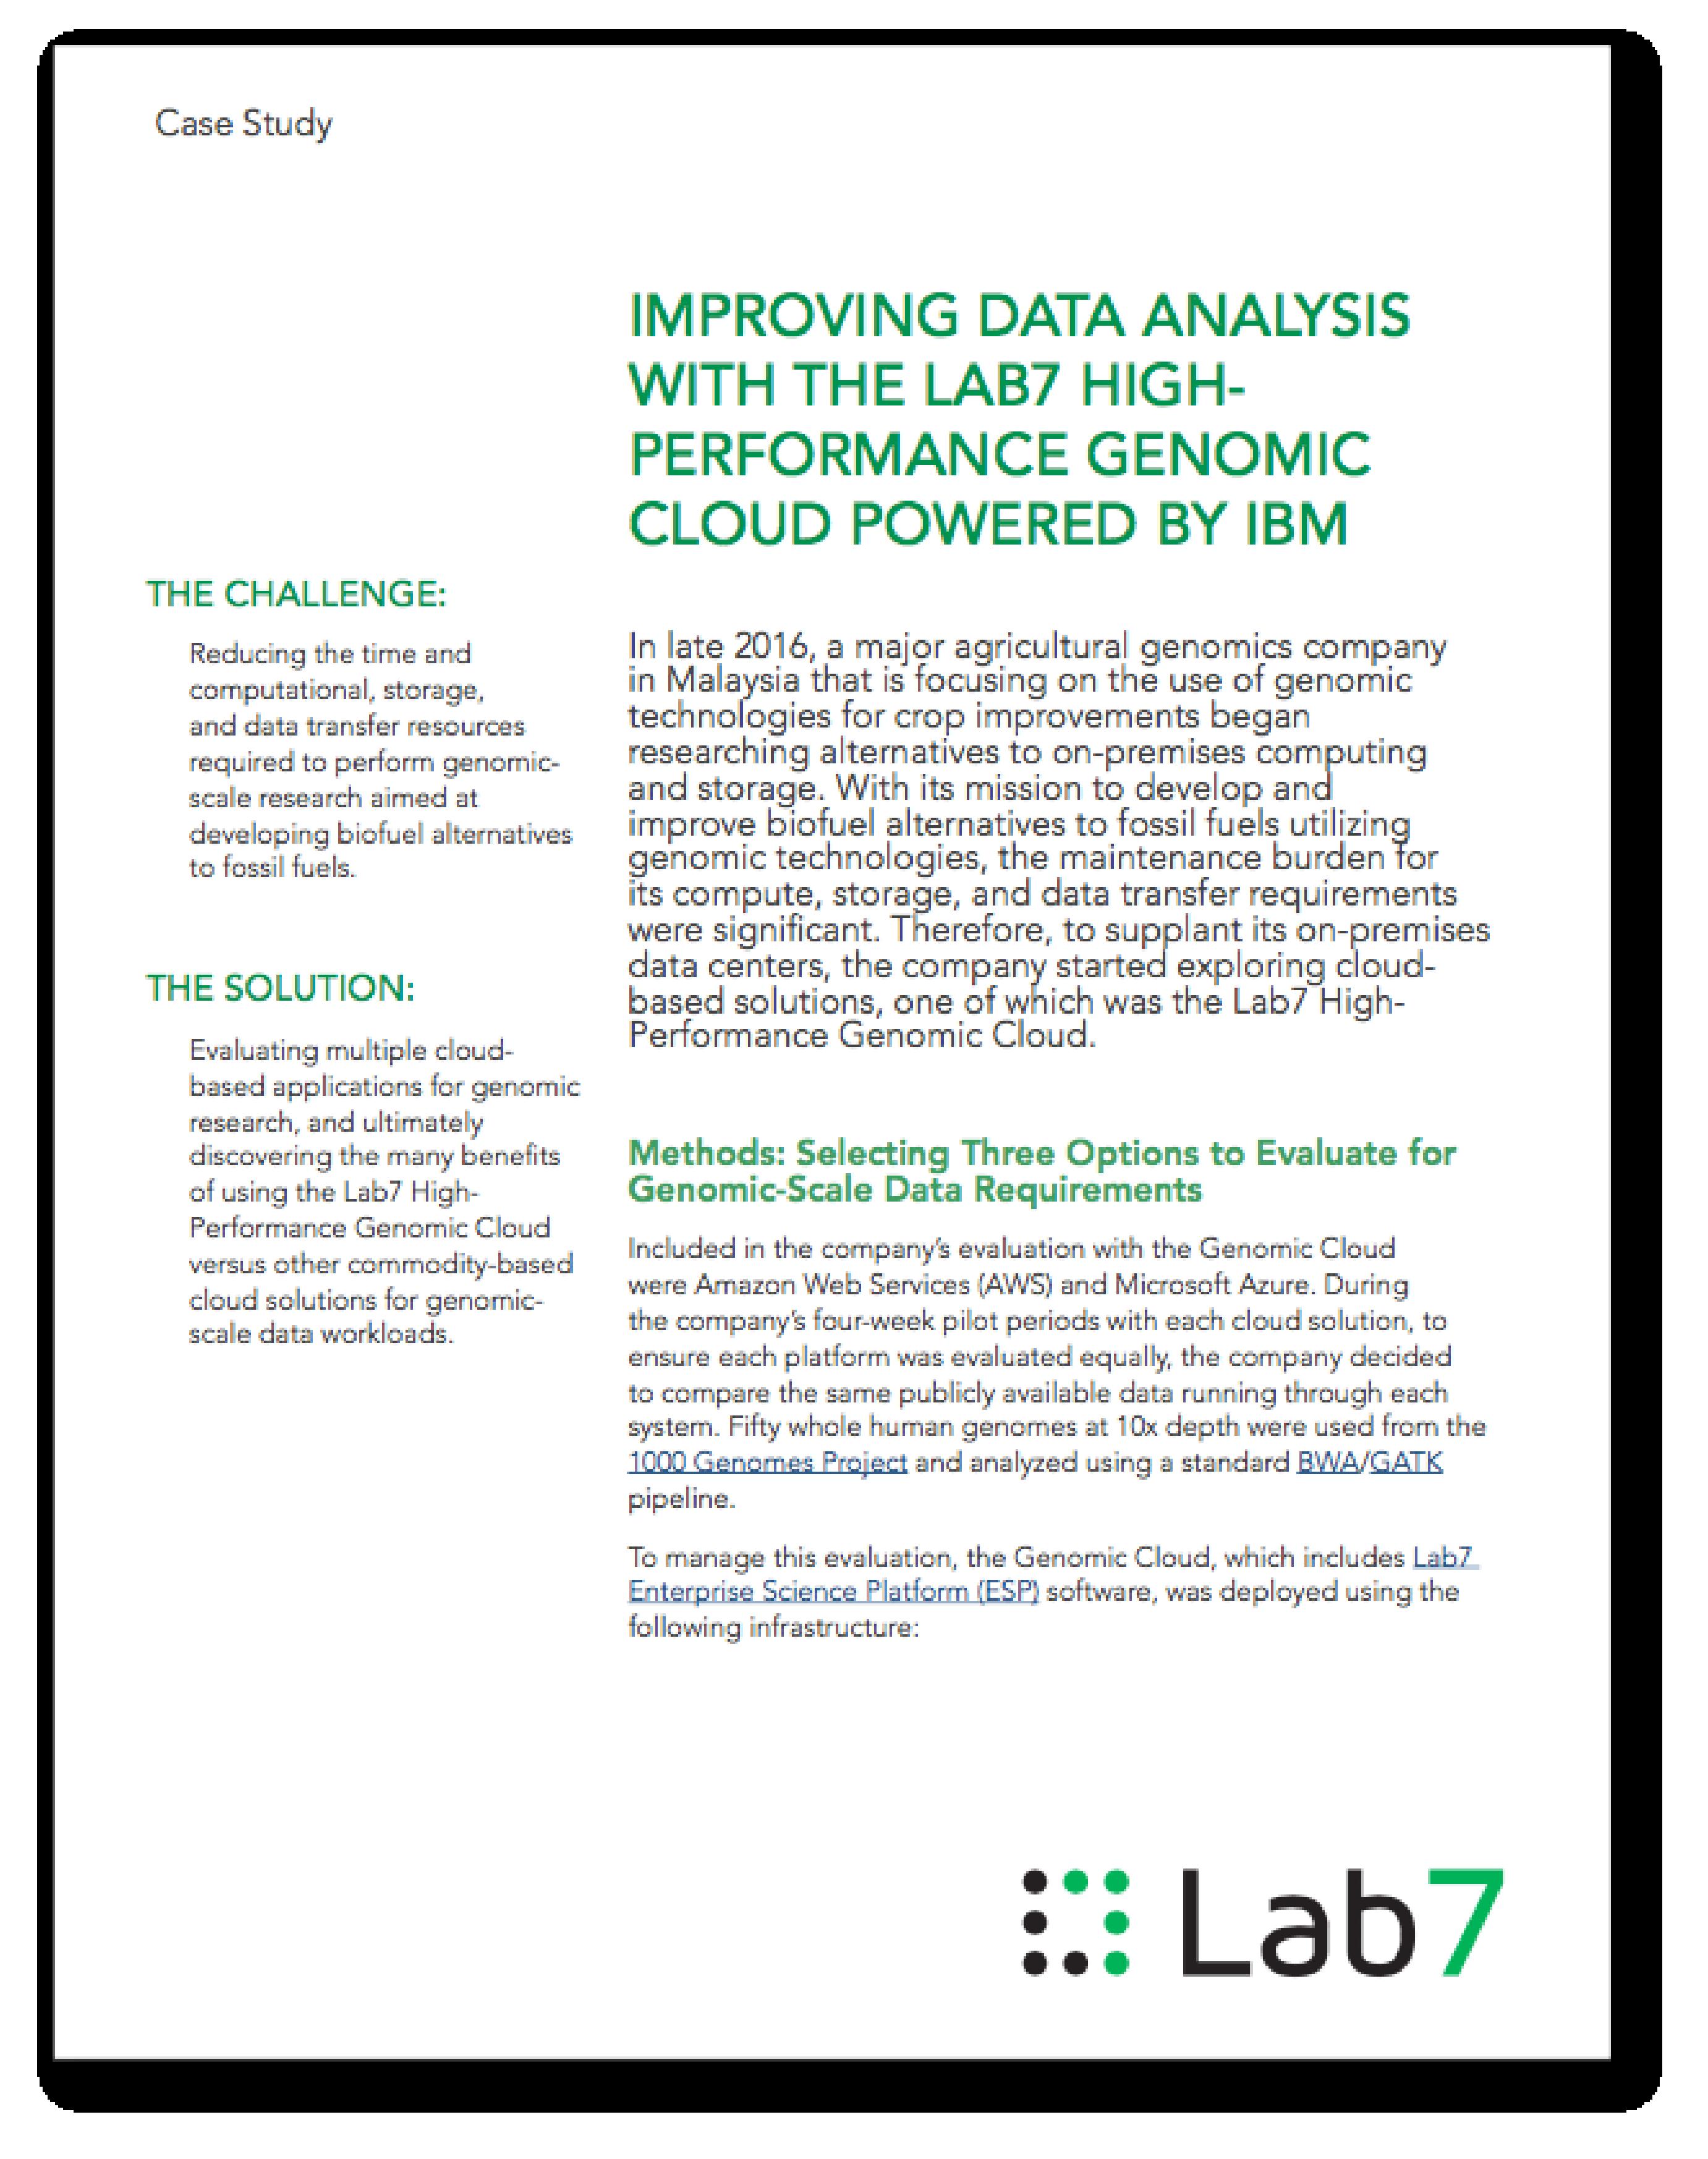 Lab7_Genomic Cloud Case Study_Cover_drop shadow-01.png